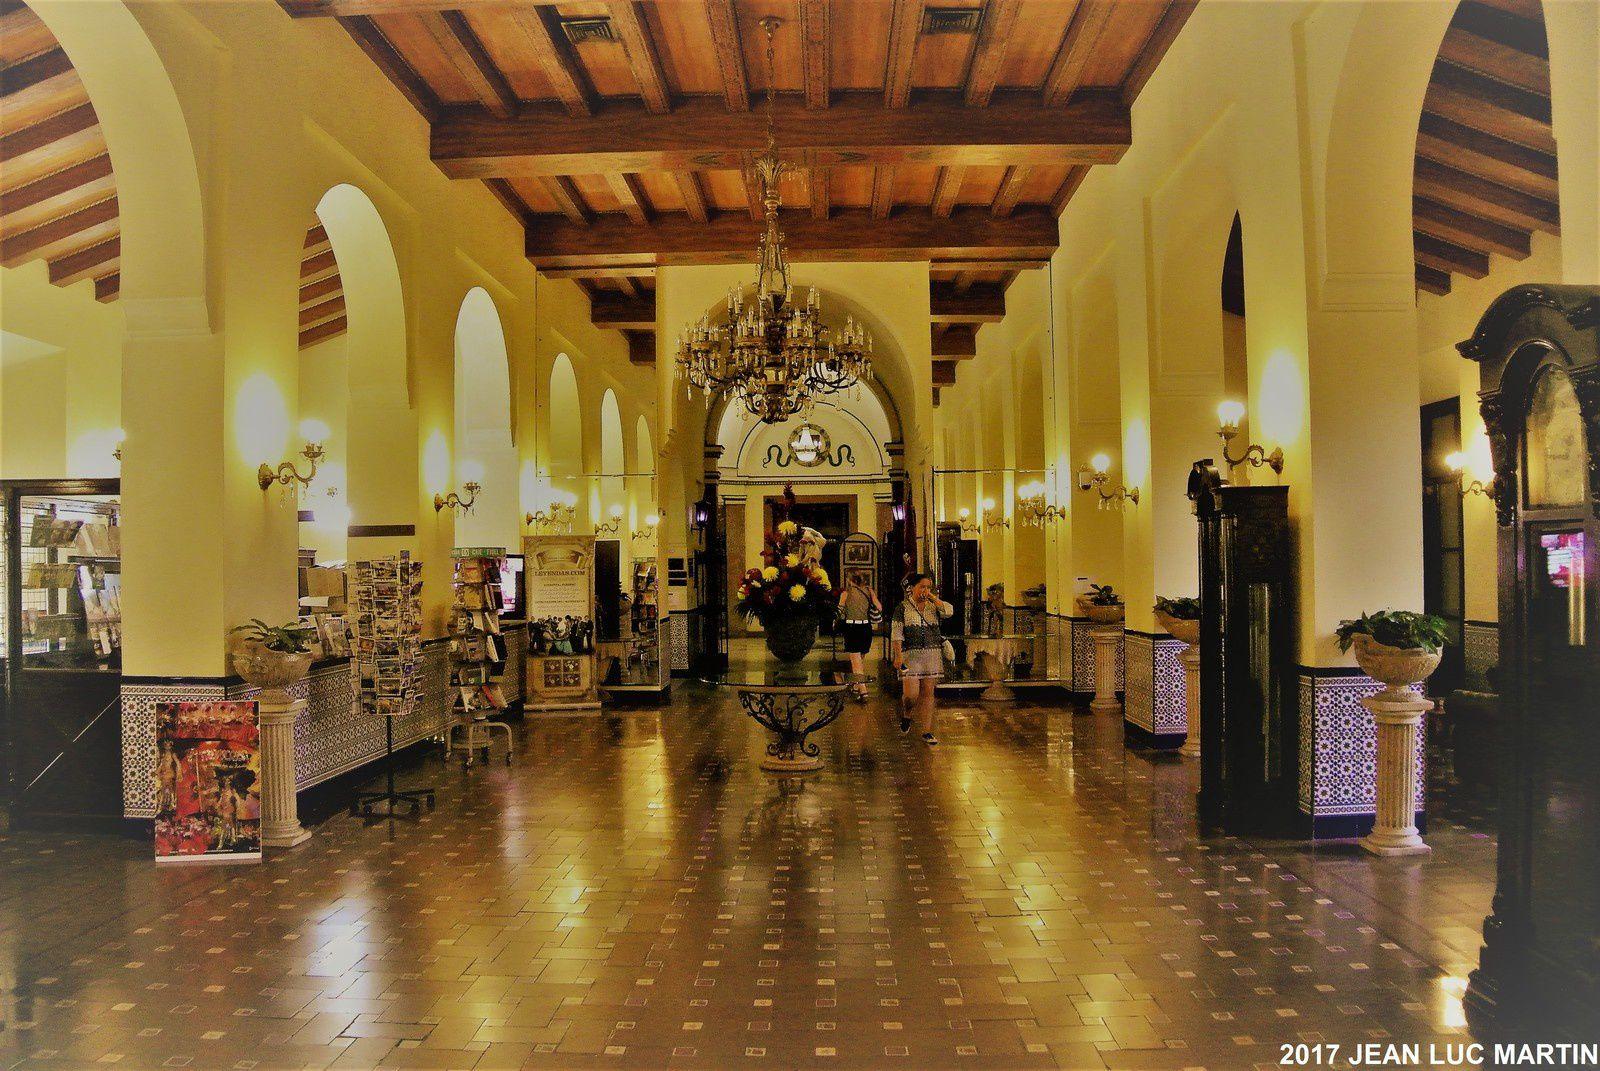 QUAND SINATRA CHANTAIT A L'HOTEL NATIONAL A LA HAVANE